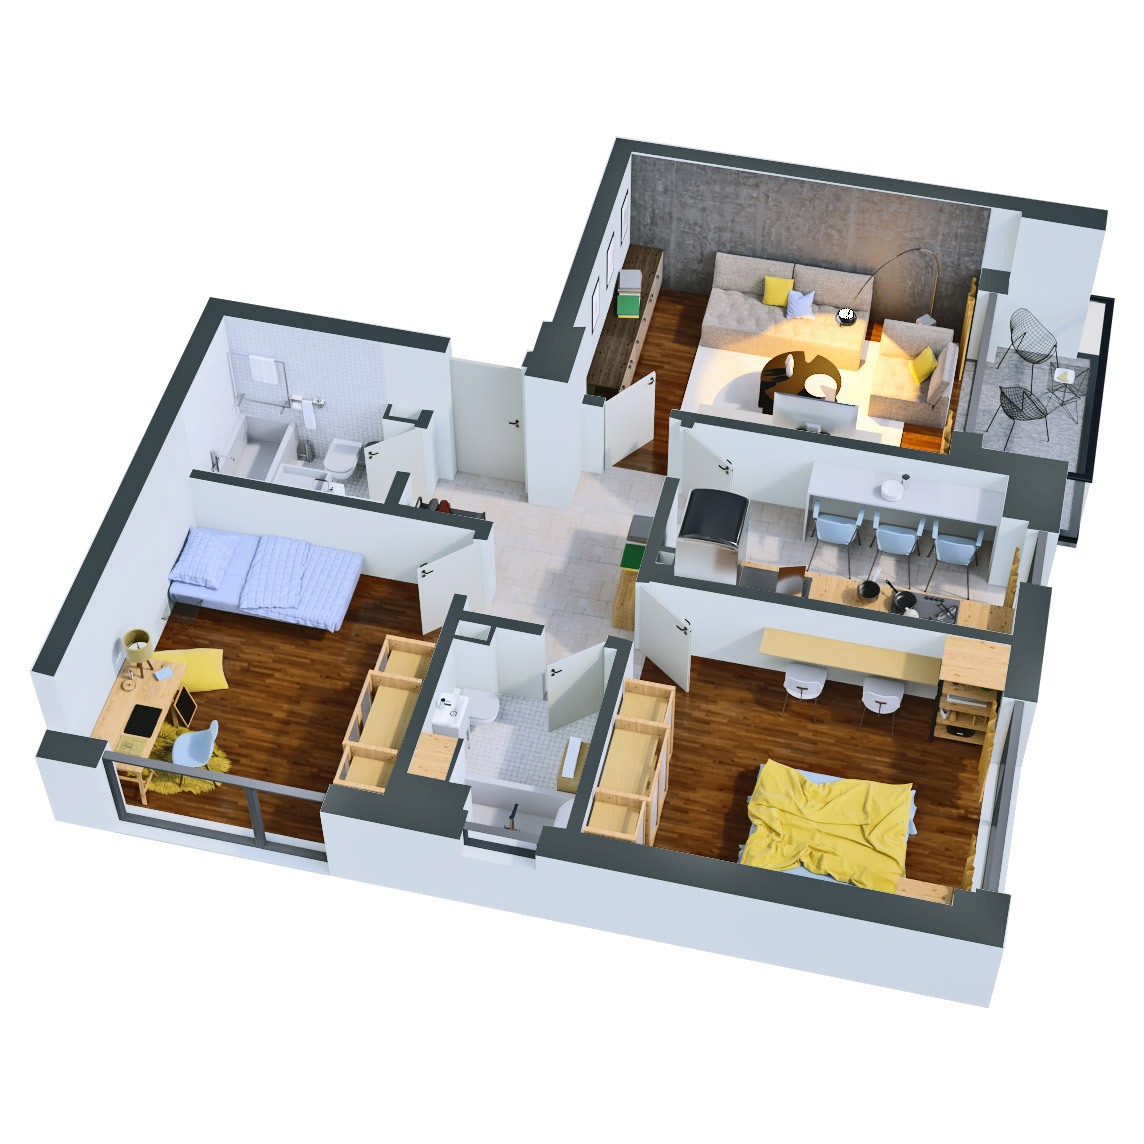 Apartament 3 camere de vanzare Bucuresti - Catedral Residence - Marriott, Piata Unirii, 13 Septembrie, Izvor - Tip 1 - T2 - B